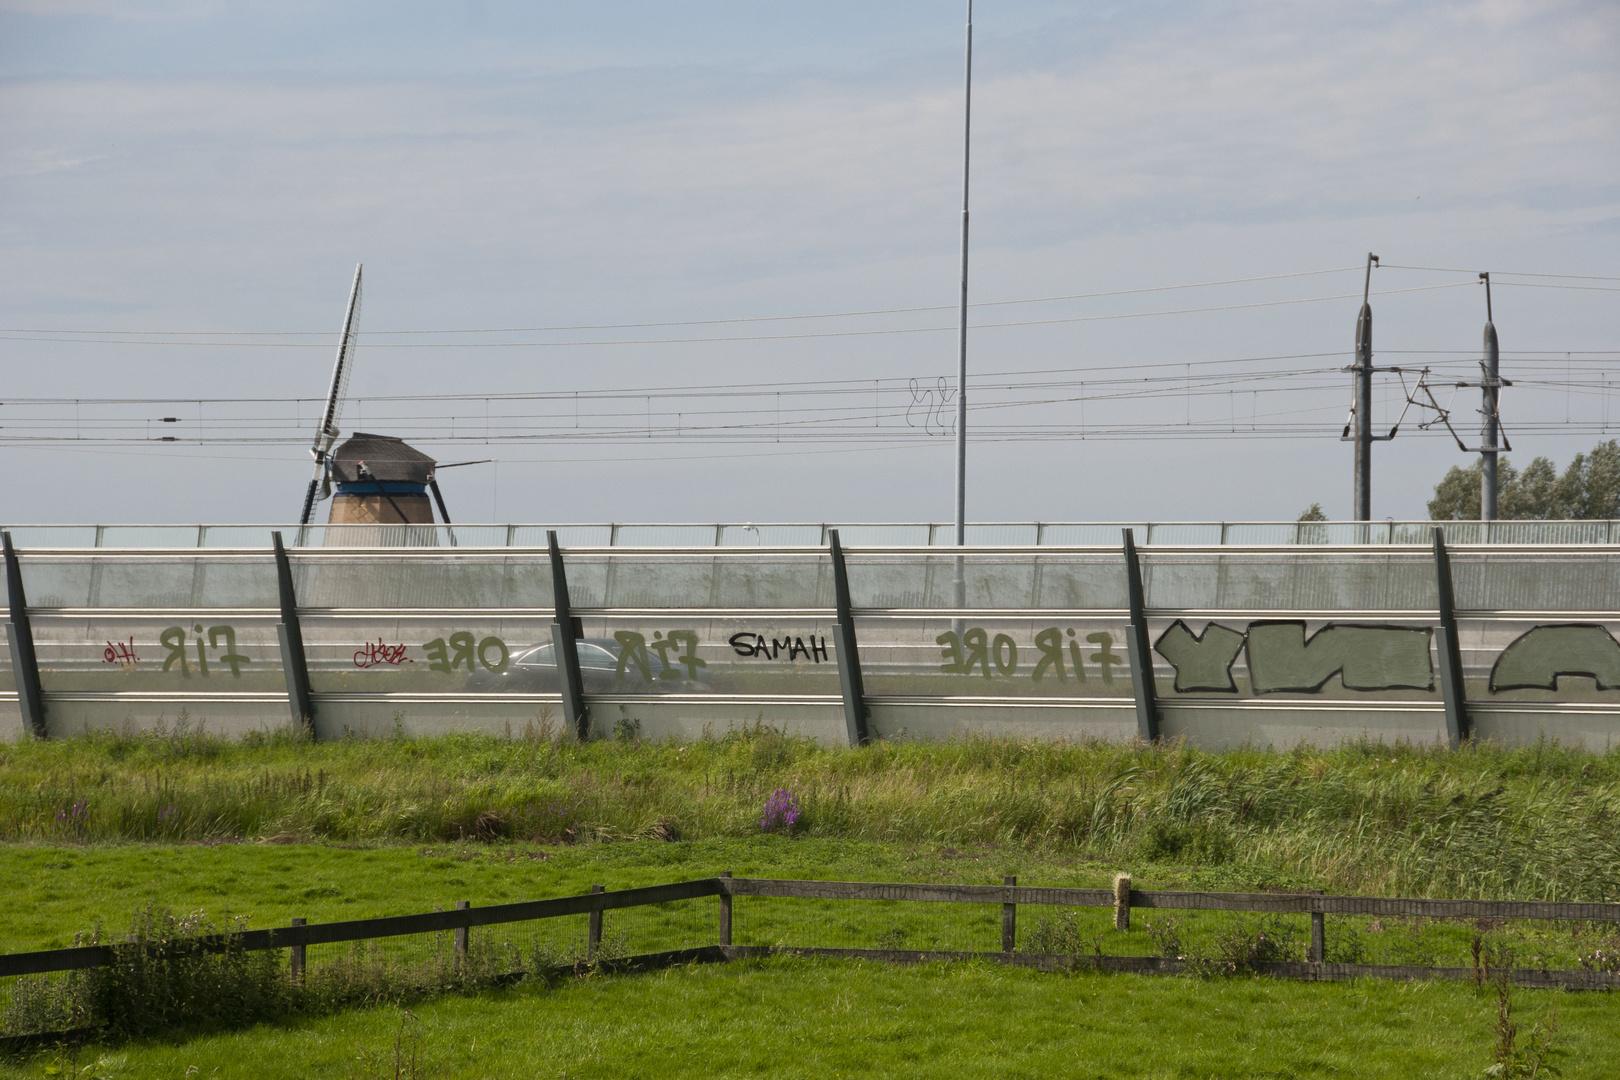 Hoogmade - Hoogmadeseweg - Motorway A4 and High Speed Railway